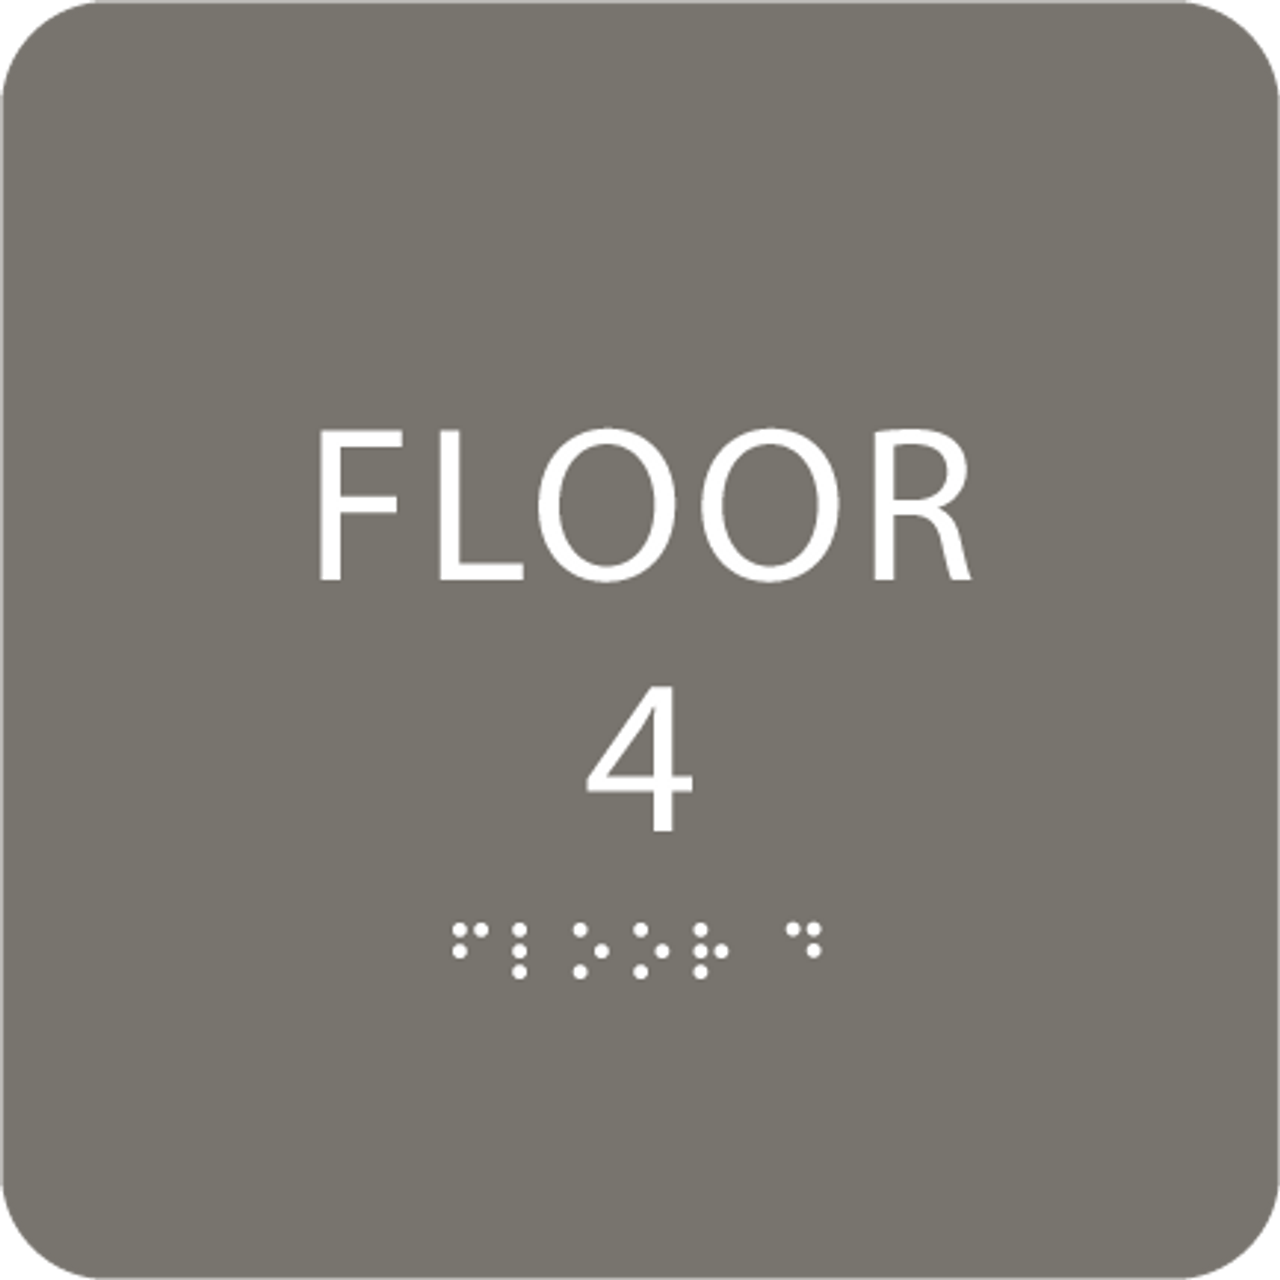 Dark Grey Floor 4 Identification Sign